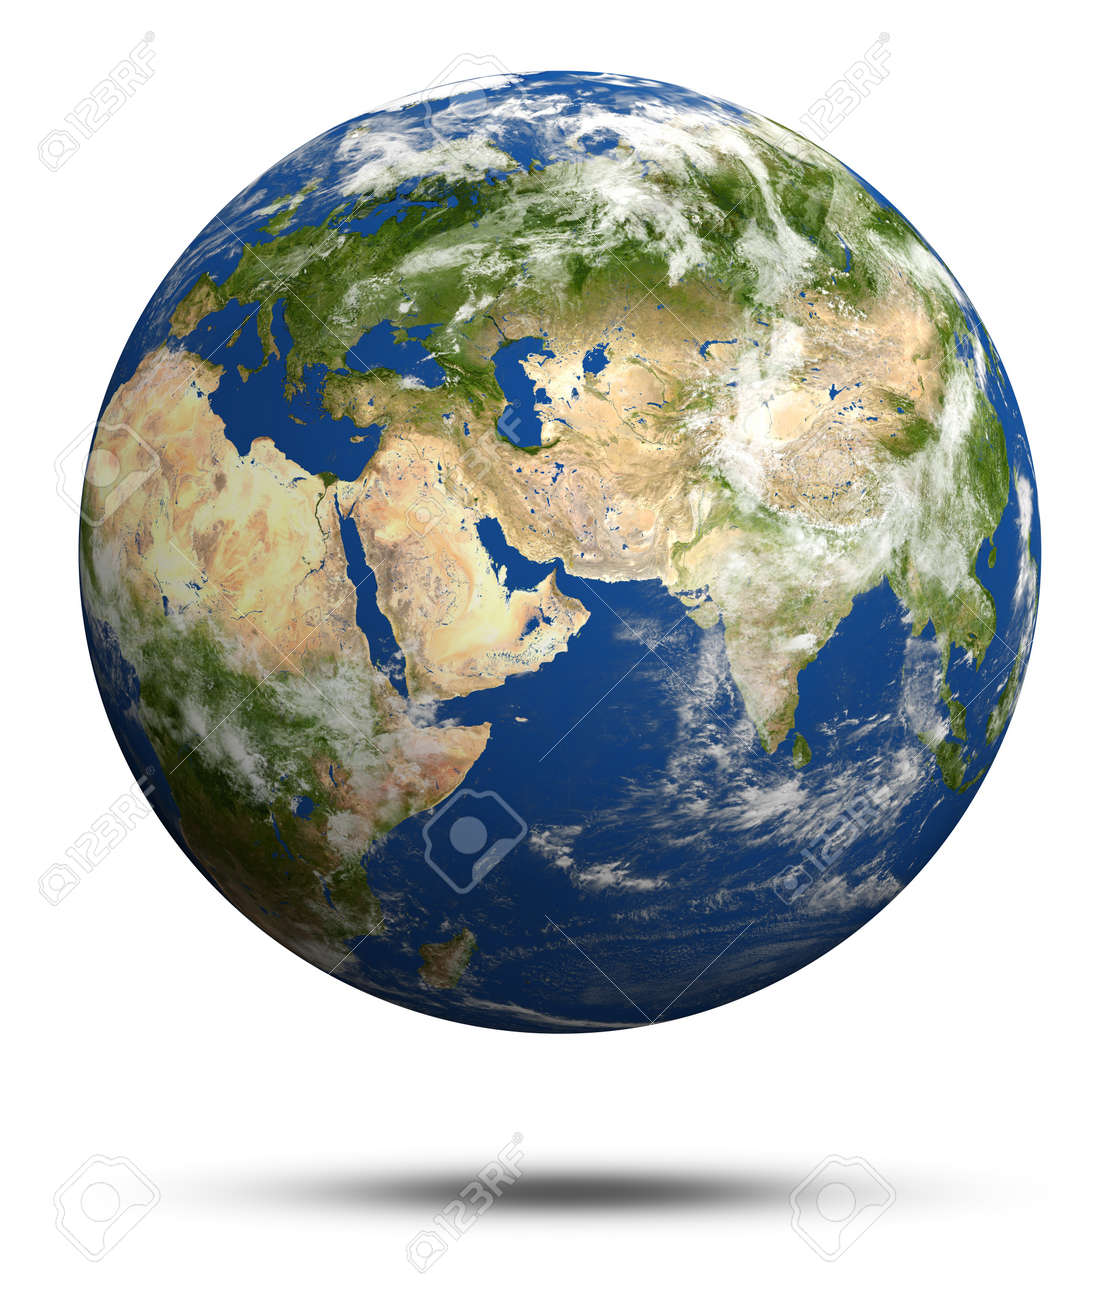 Planet Earth 3d Render. Earth Globe Model, Maps Courtesy Of NASA ...